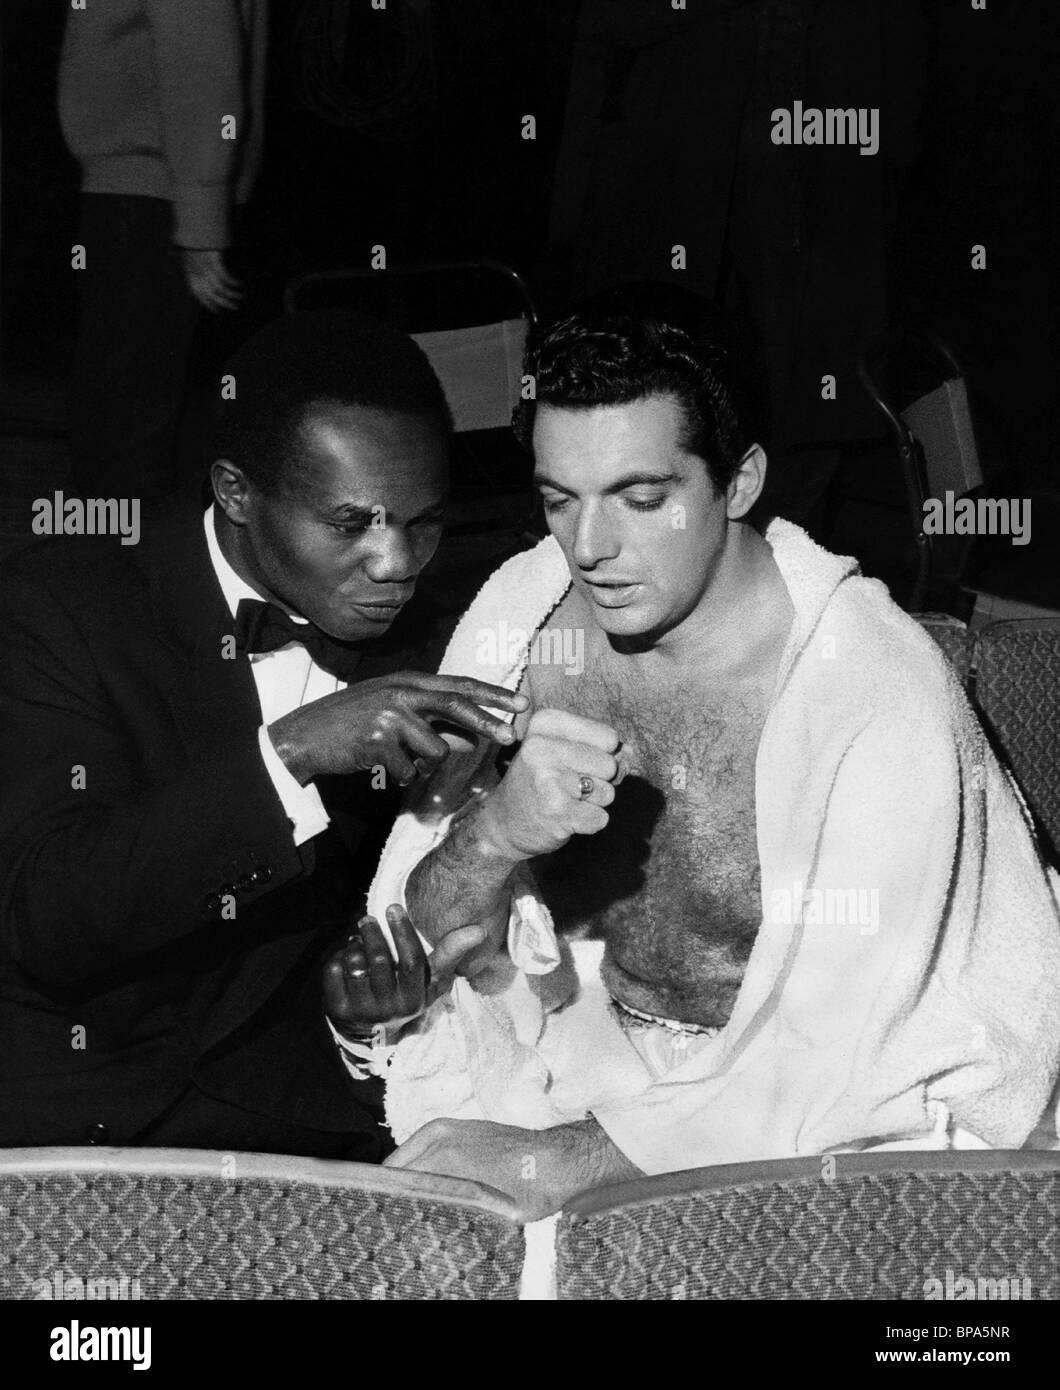 HOGAN 'KID' BASSEY & FRANKIE VAUGHAN THE HEART OF A MAN; (1959) - Stock Image